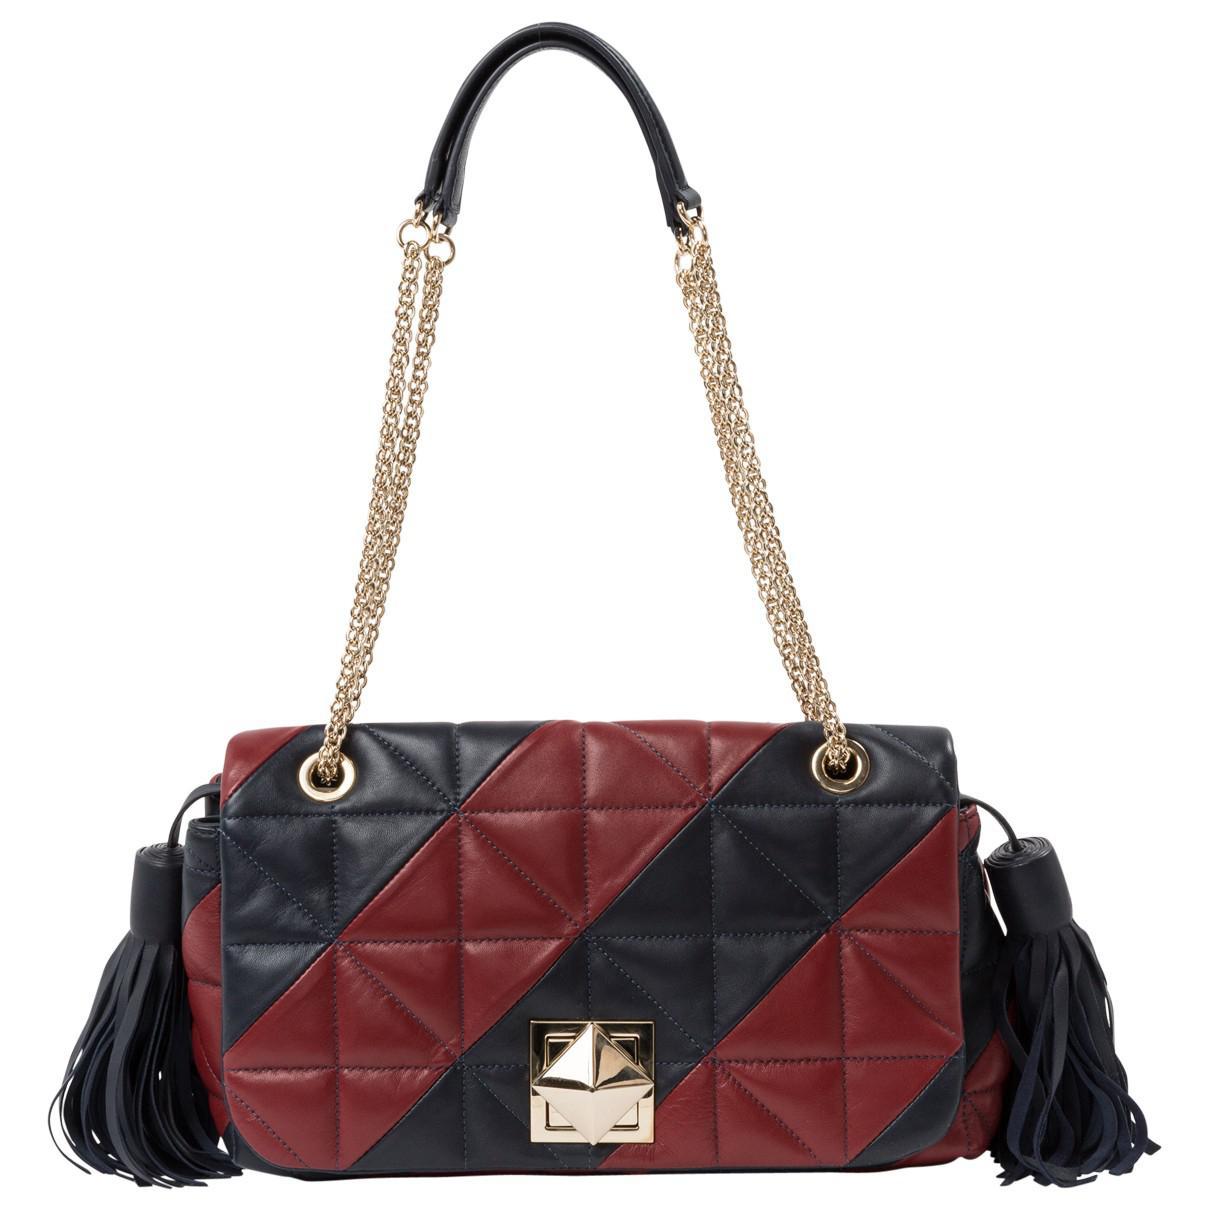 Pre-owned - Leather handbag Sonia Rykiel J3pnmdRfMu